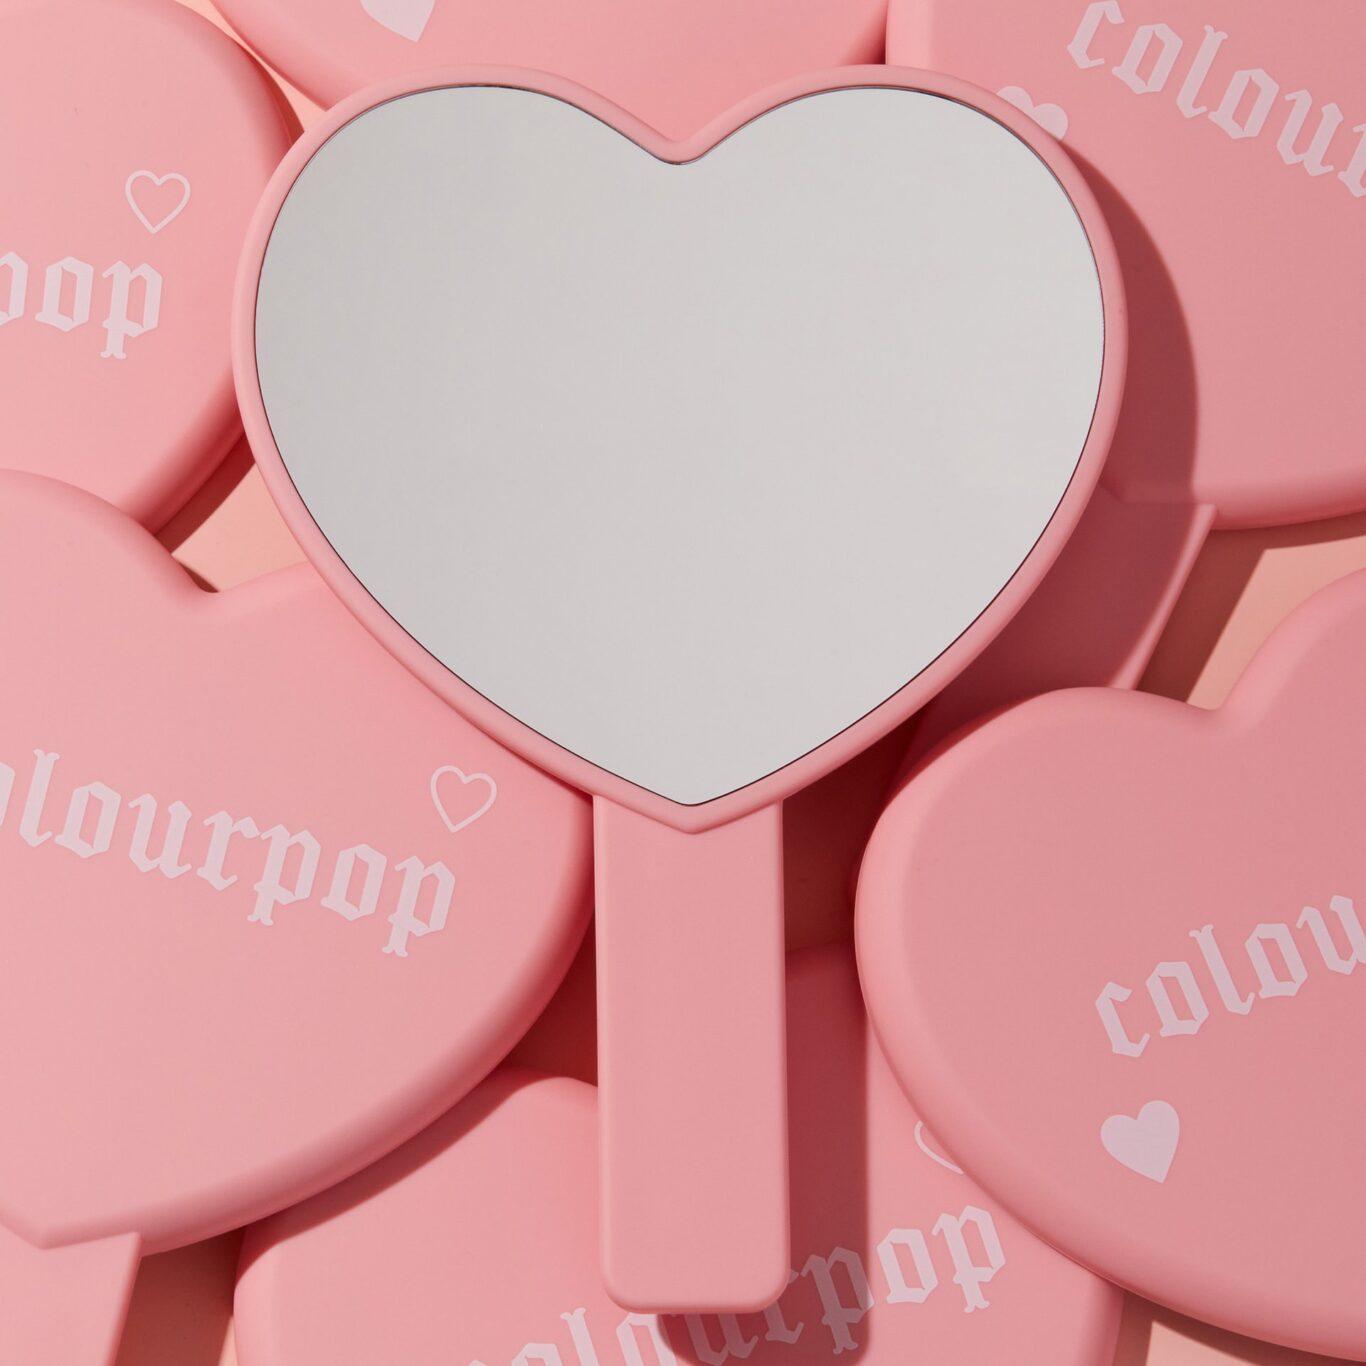 Colourpop Cosmetics Valentine's Day Collection 2021 Heart Mirror